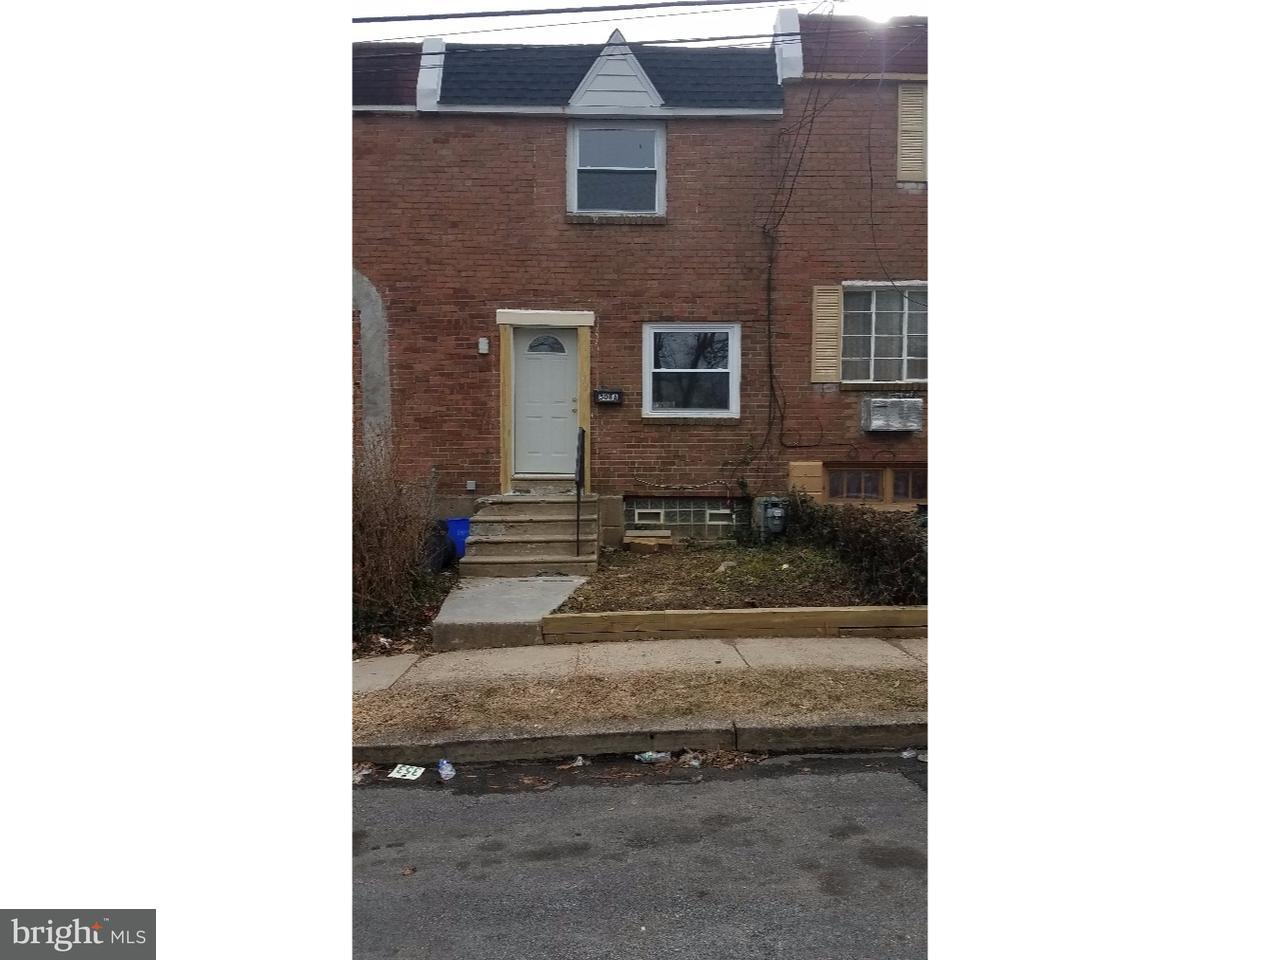 Casa unifamiliar adosada (Townhouse) por un Alquiler en 508A FERN Street Darby, Pennsylvania 19023 Estados Unidos